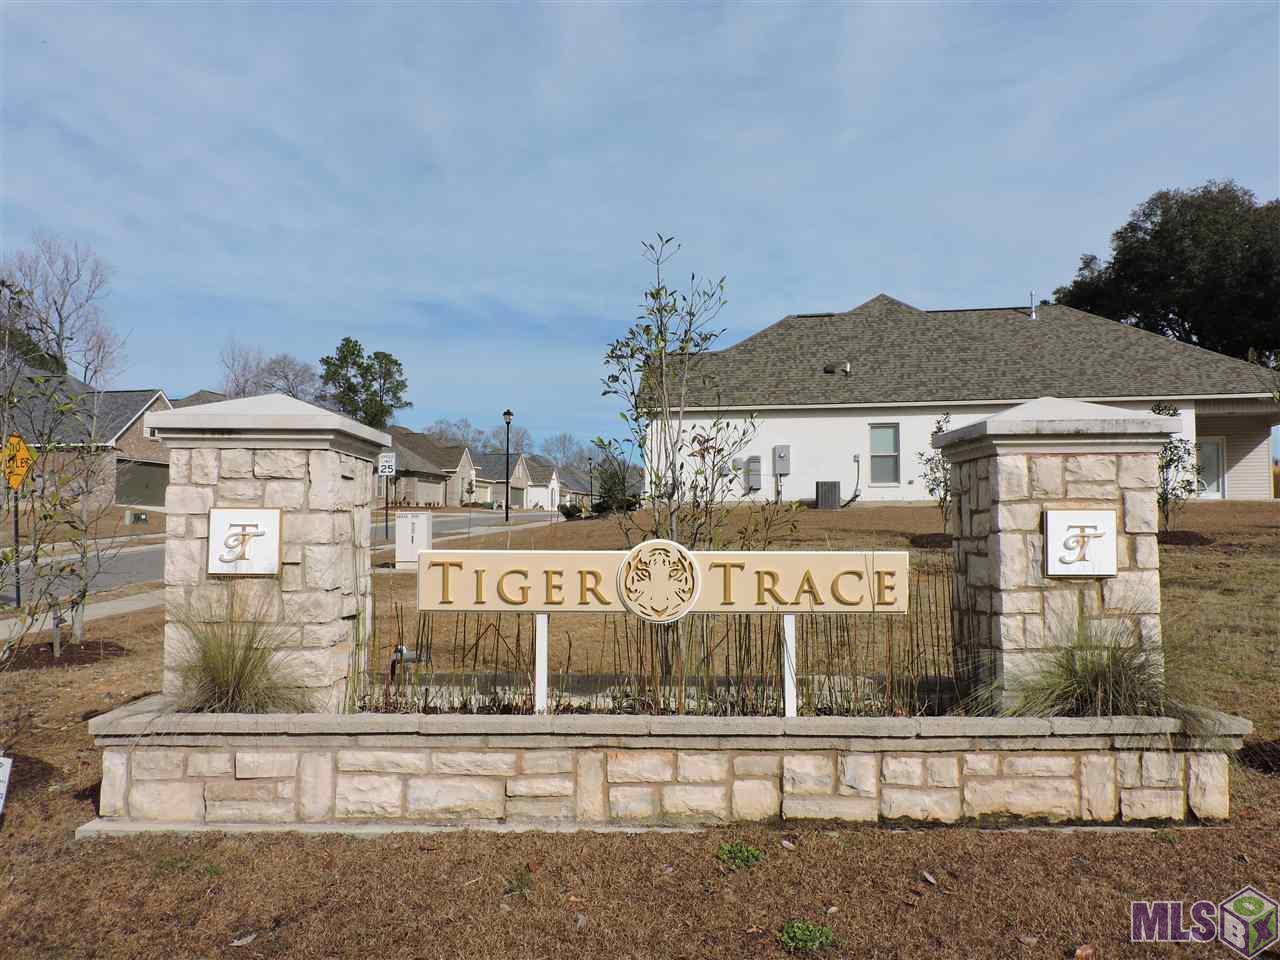 6226 TIGER TRACE AVE, Baton Rouge, LA 70817